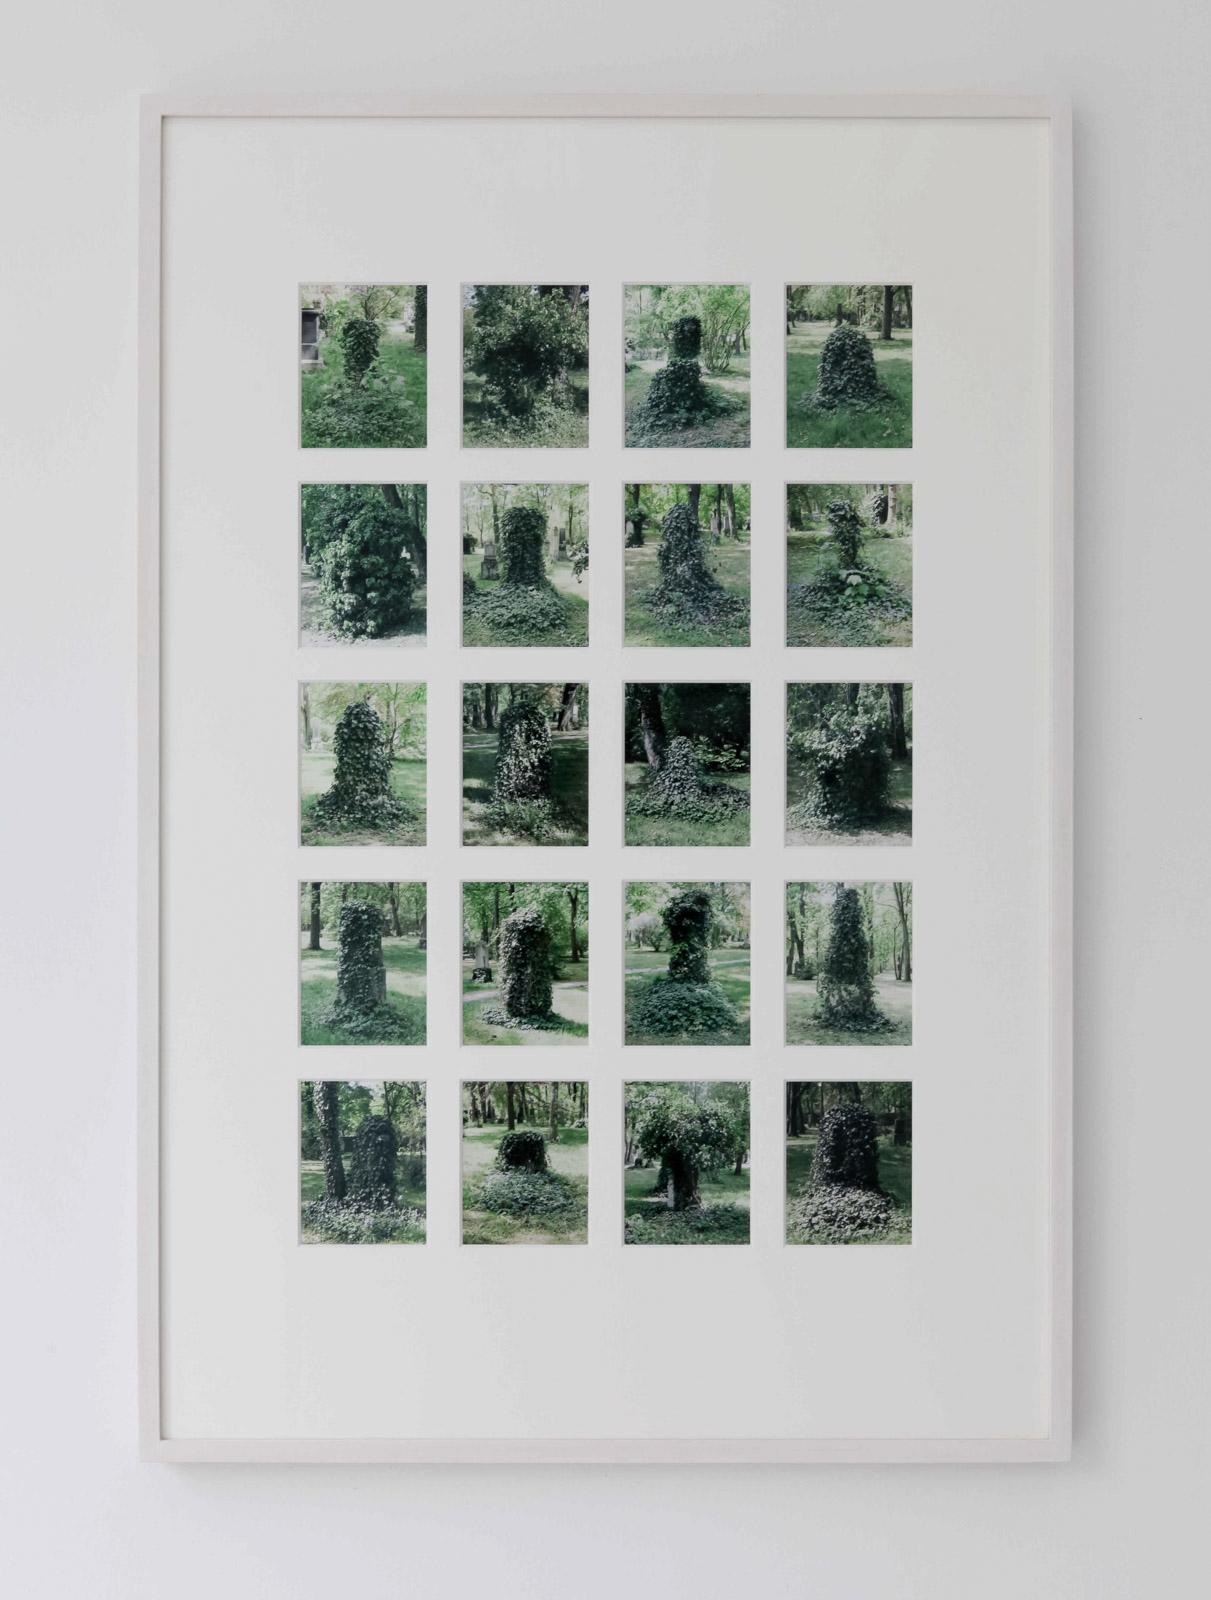 Lisa Tan, Alter Nordfriedhof, 2007-2011, 20 C-print photographs in artists frame, 93,5 x 63,5 cm, Edition 5